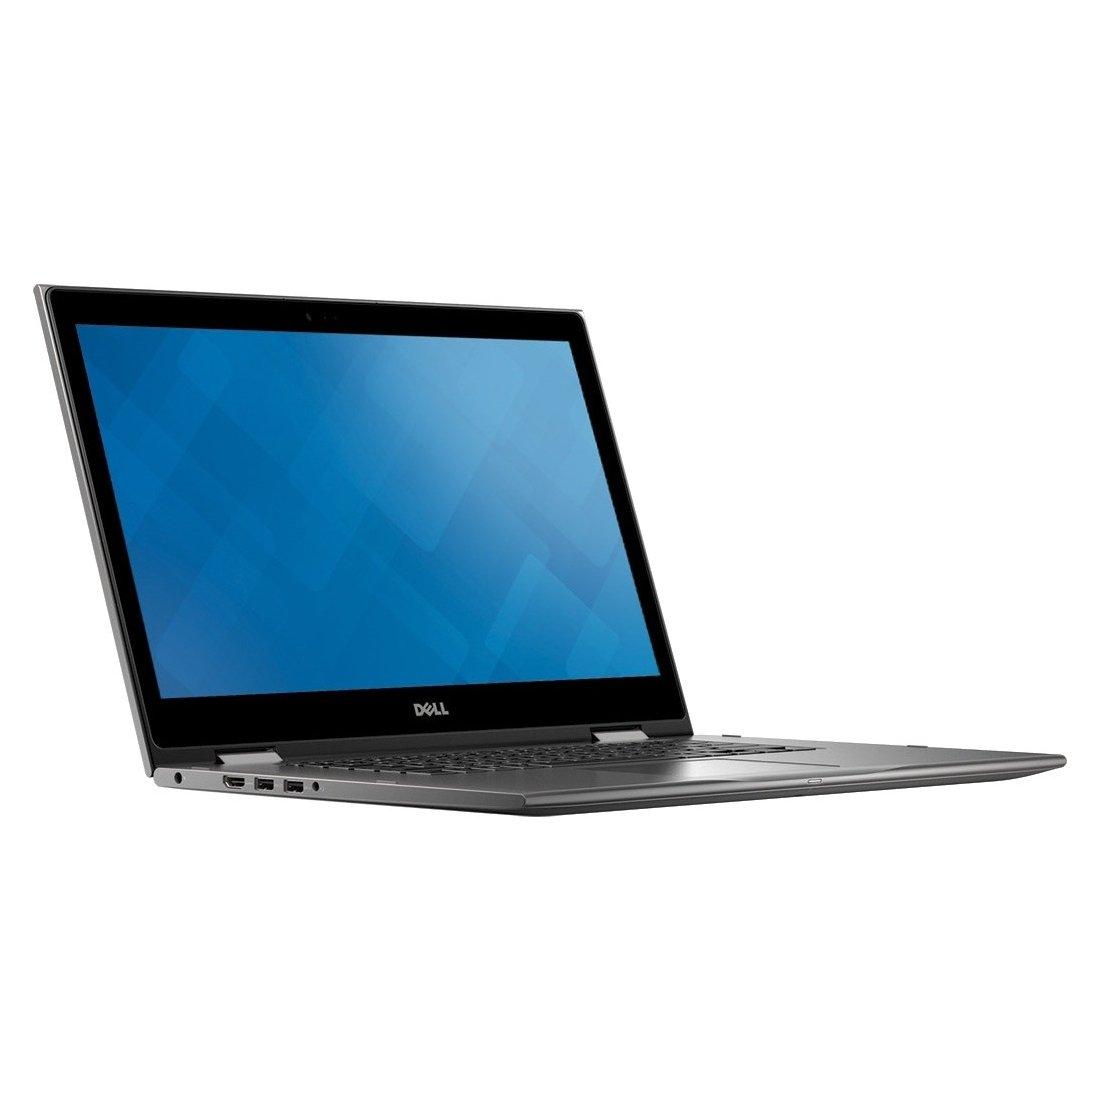 Dell Inspiron i5568 5240